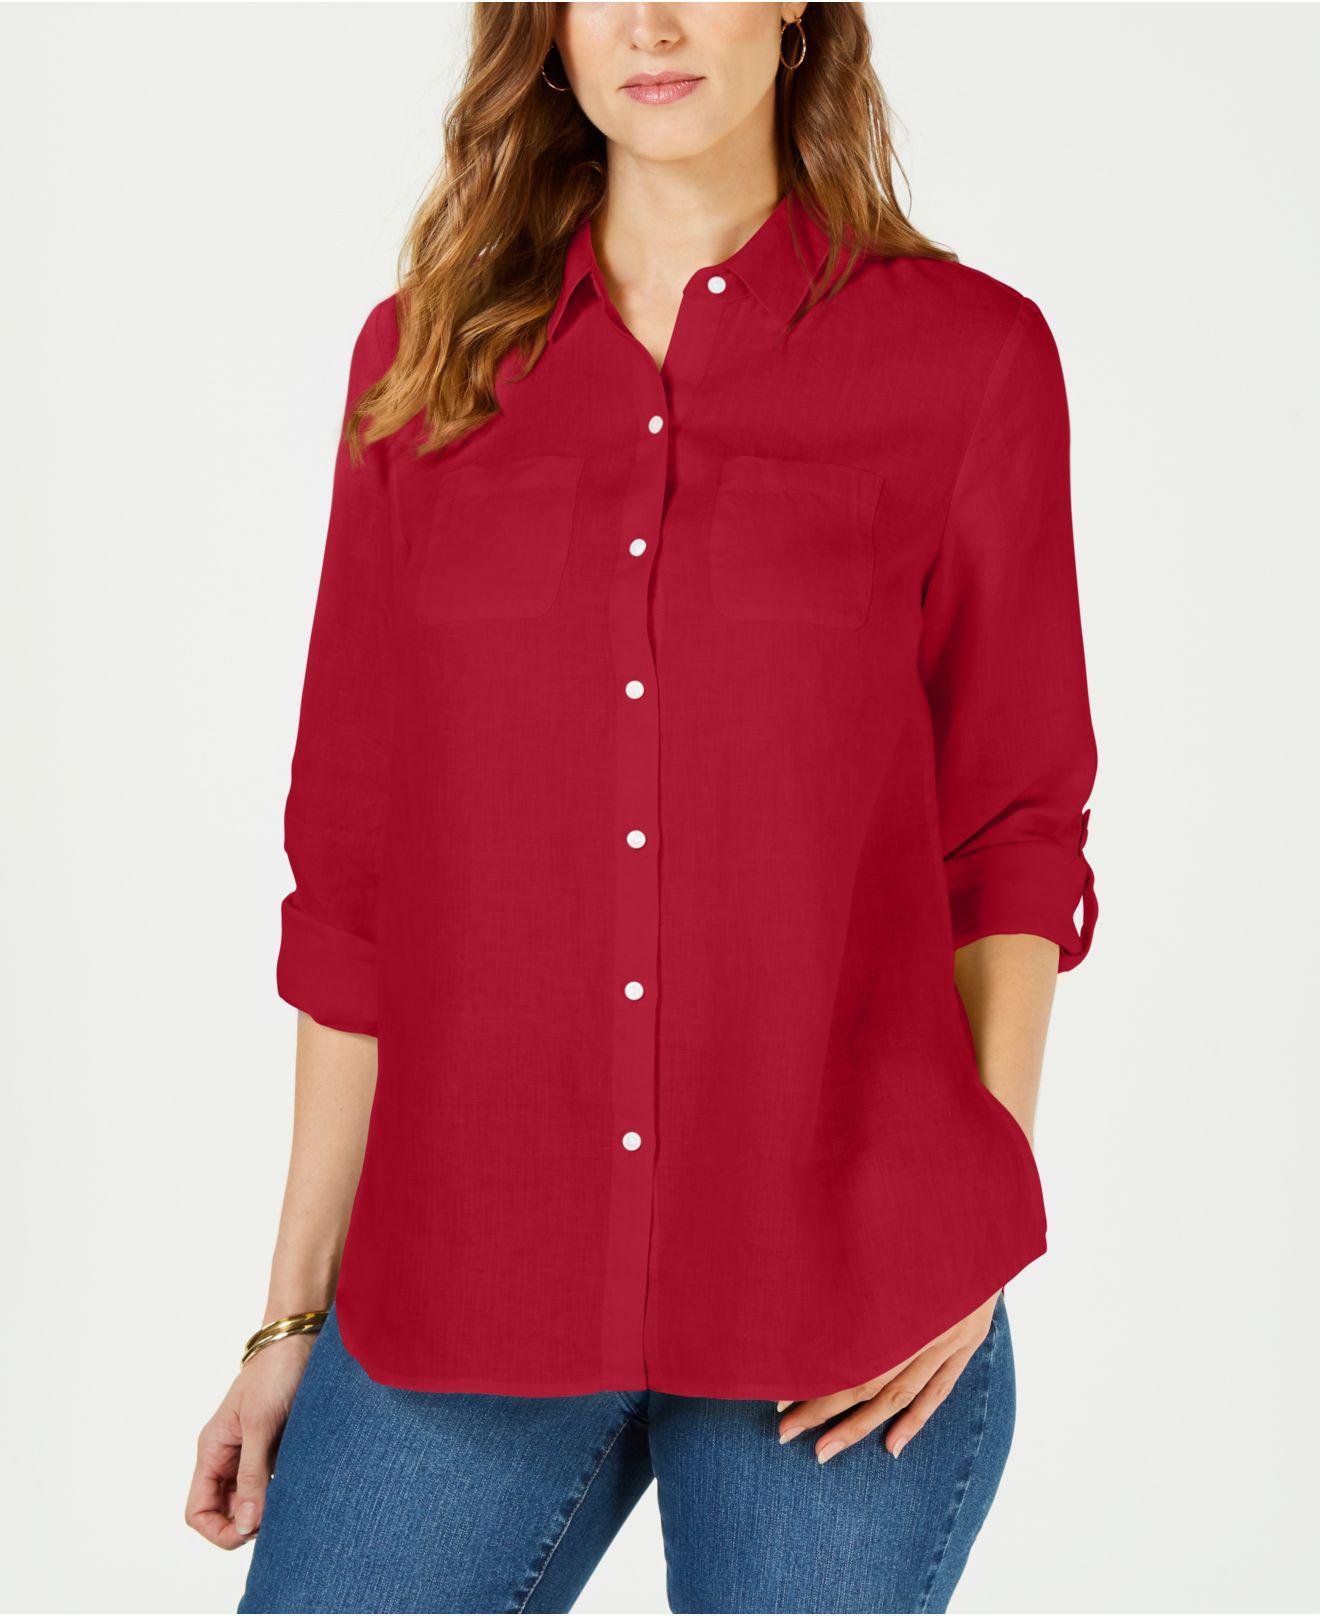 2eeeb79a259 Charter Club. Women s Red Linen Utility Shirt ...